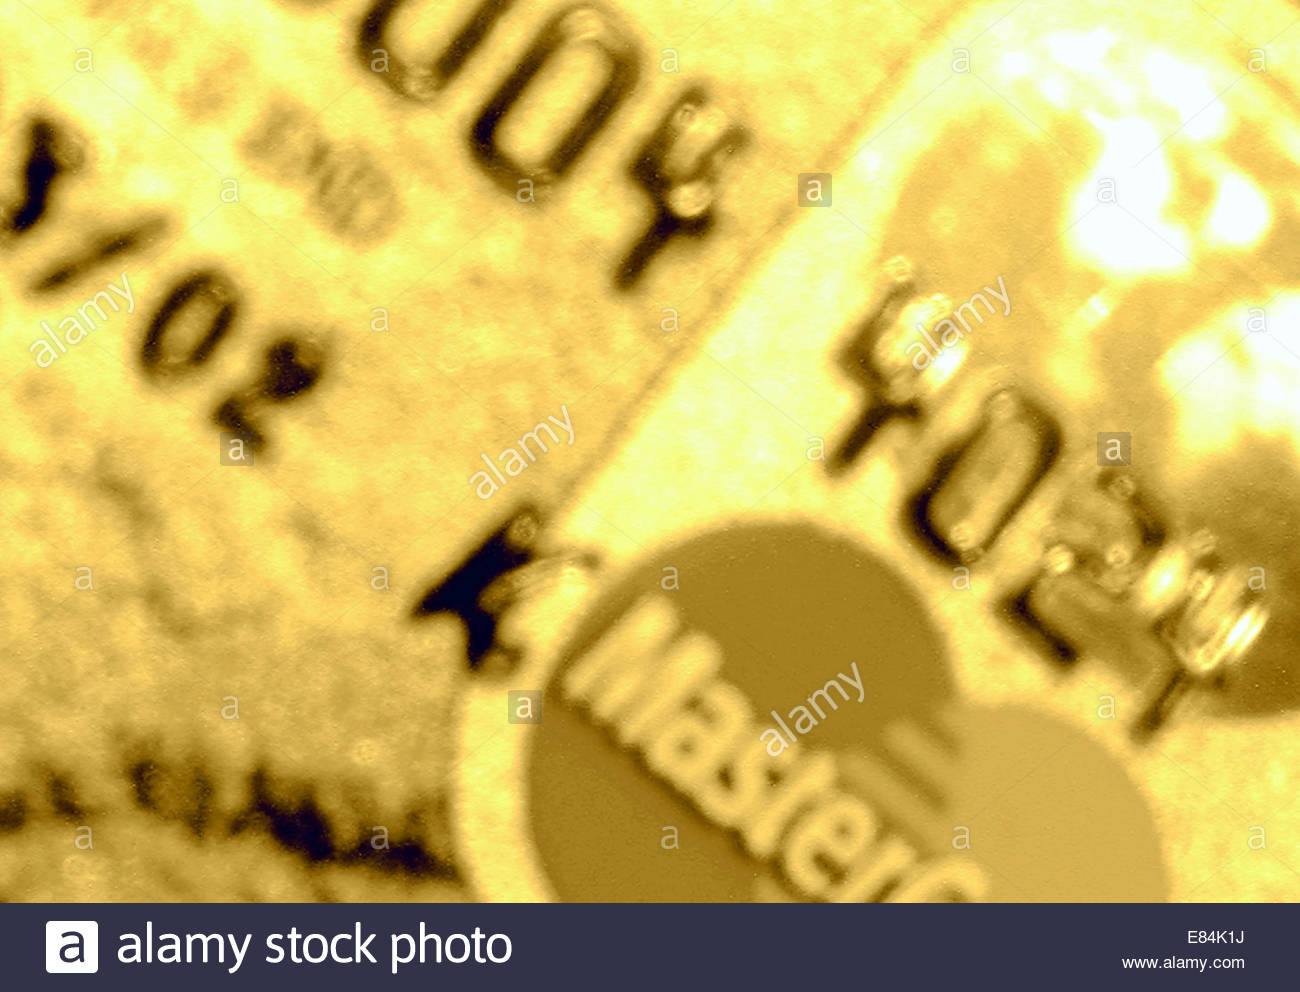 Credit card close-up with 'pop art' filter - Stock Image